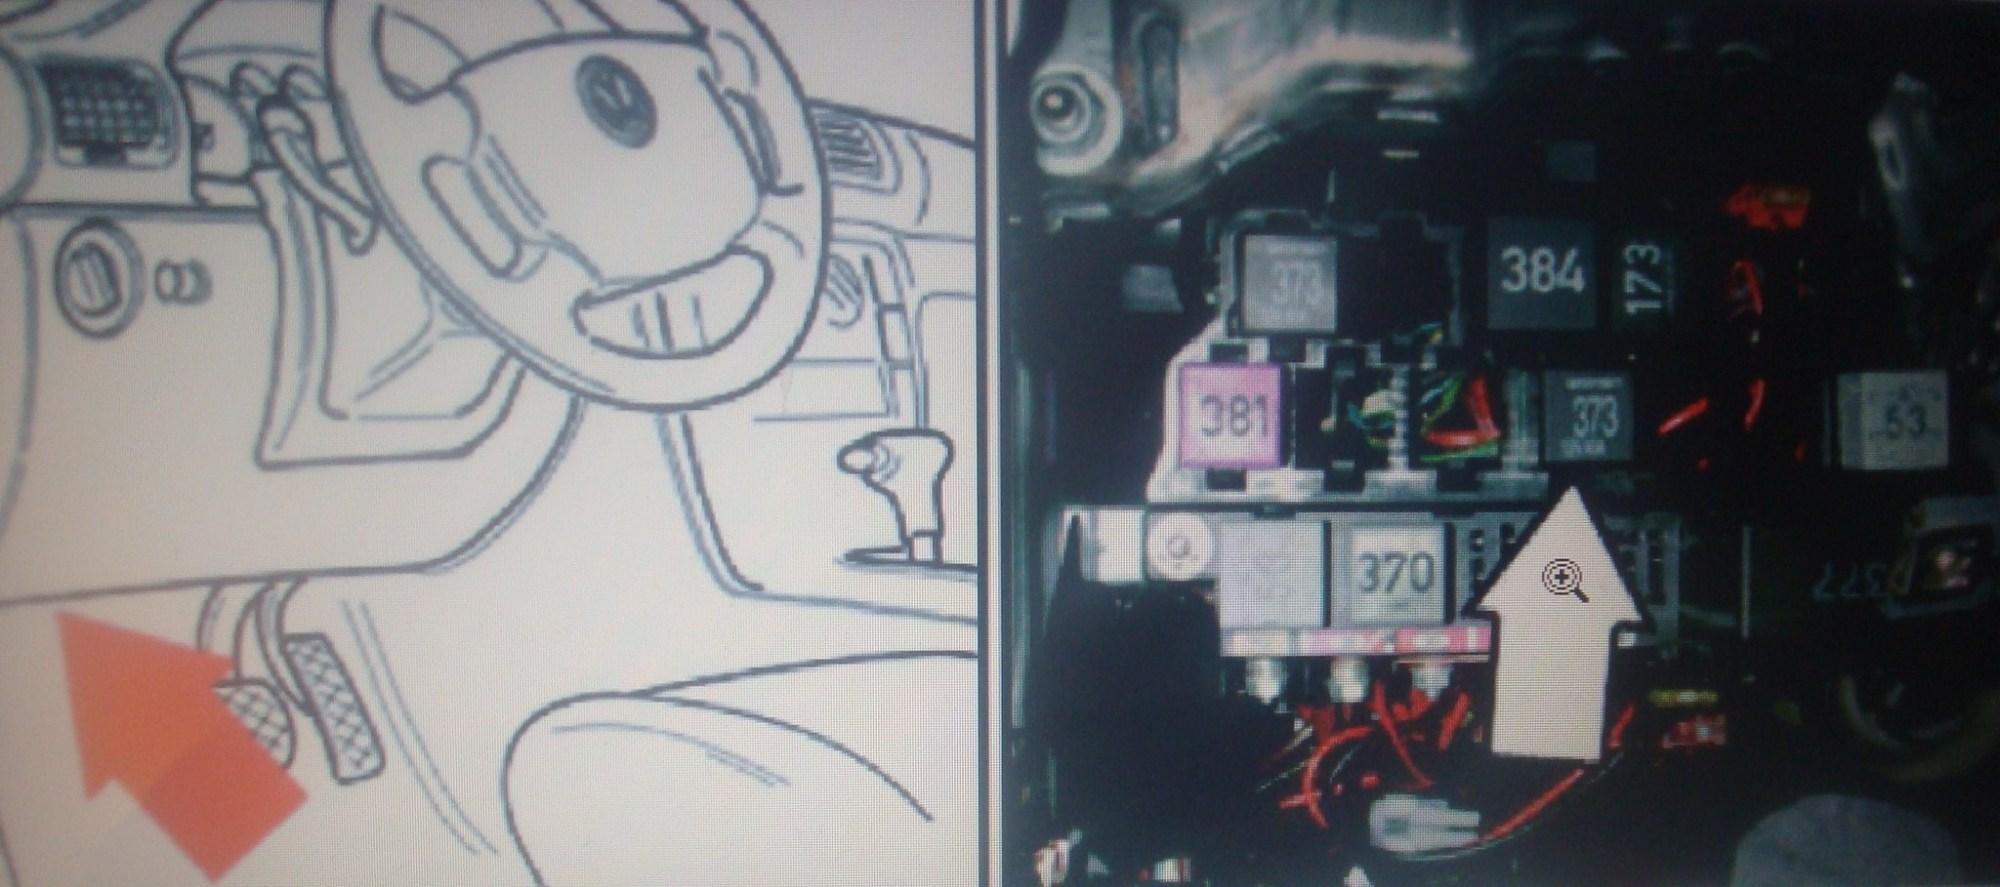 hight resolution of vw passat fuel pump relay location